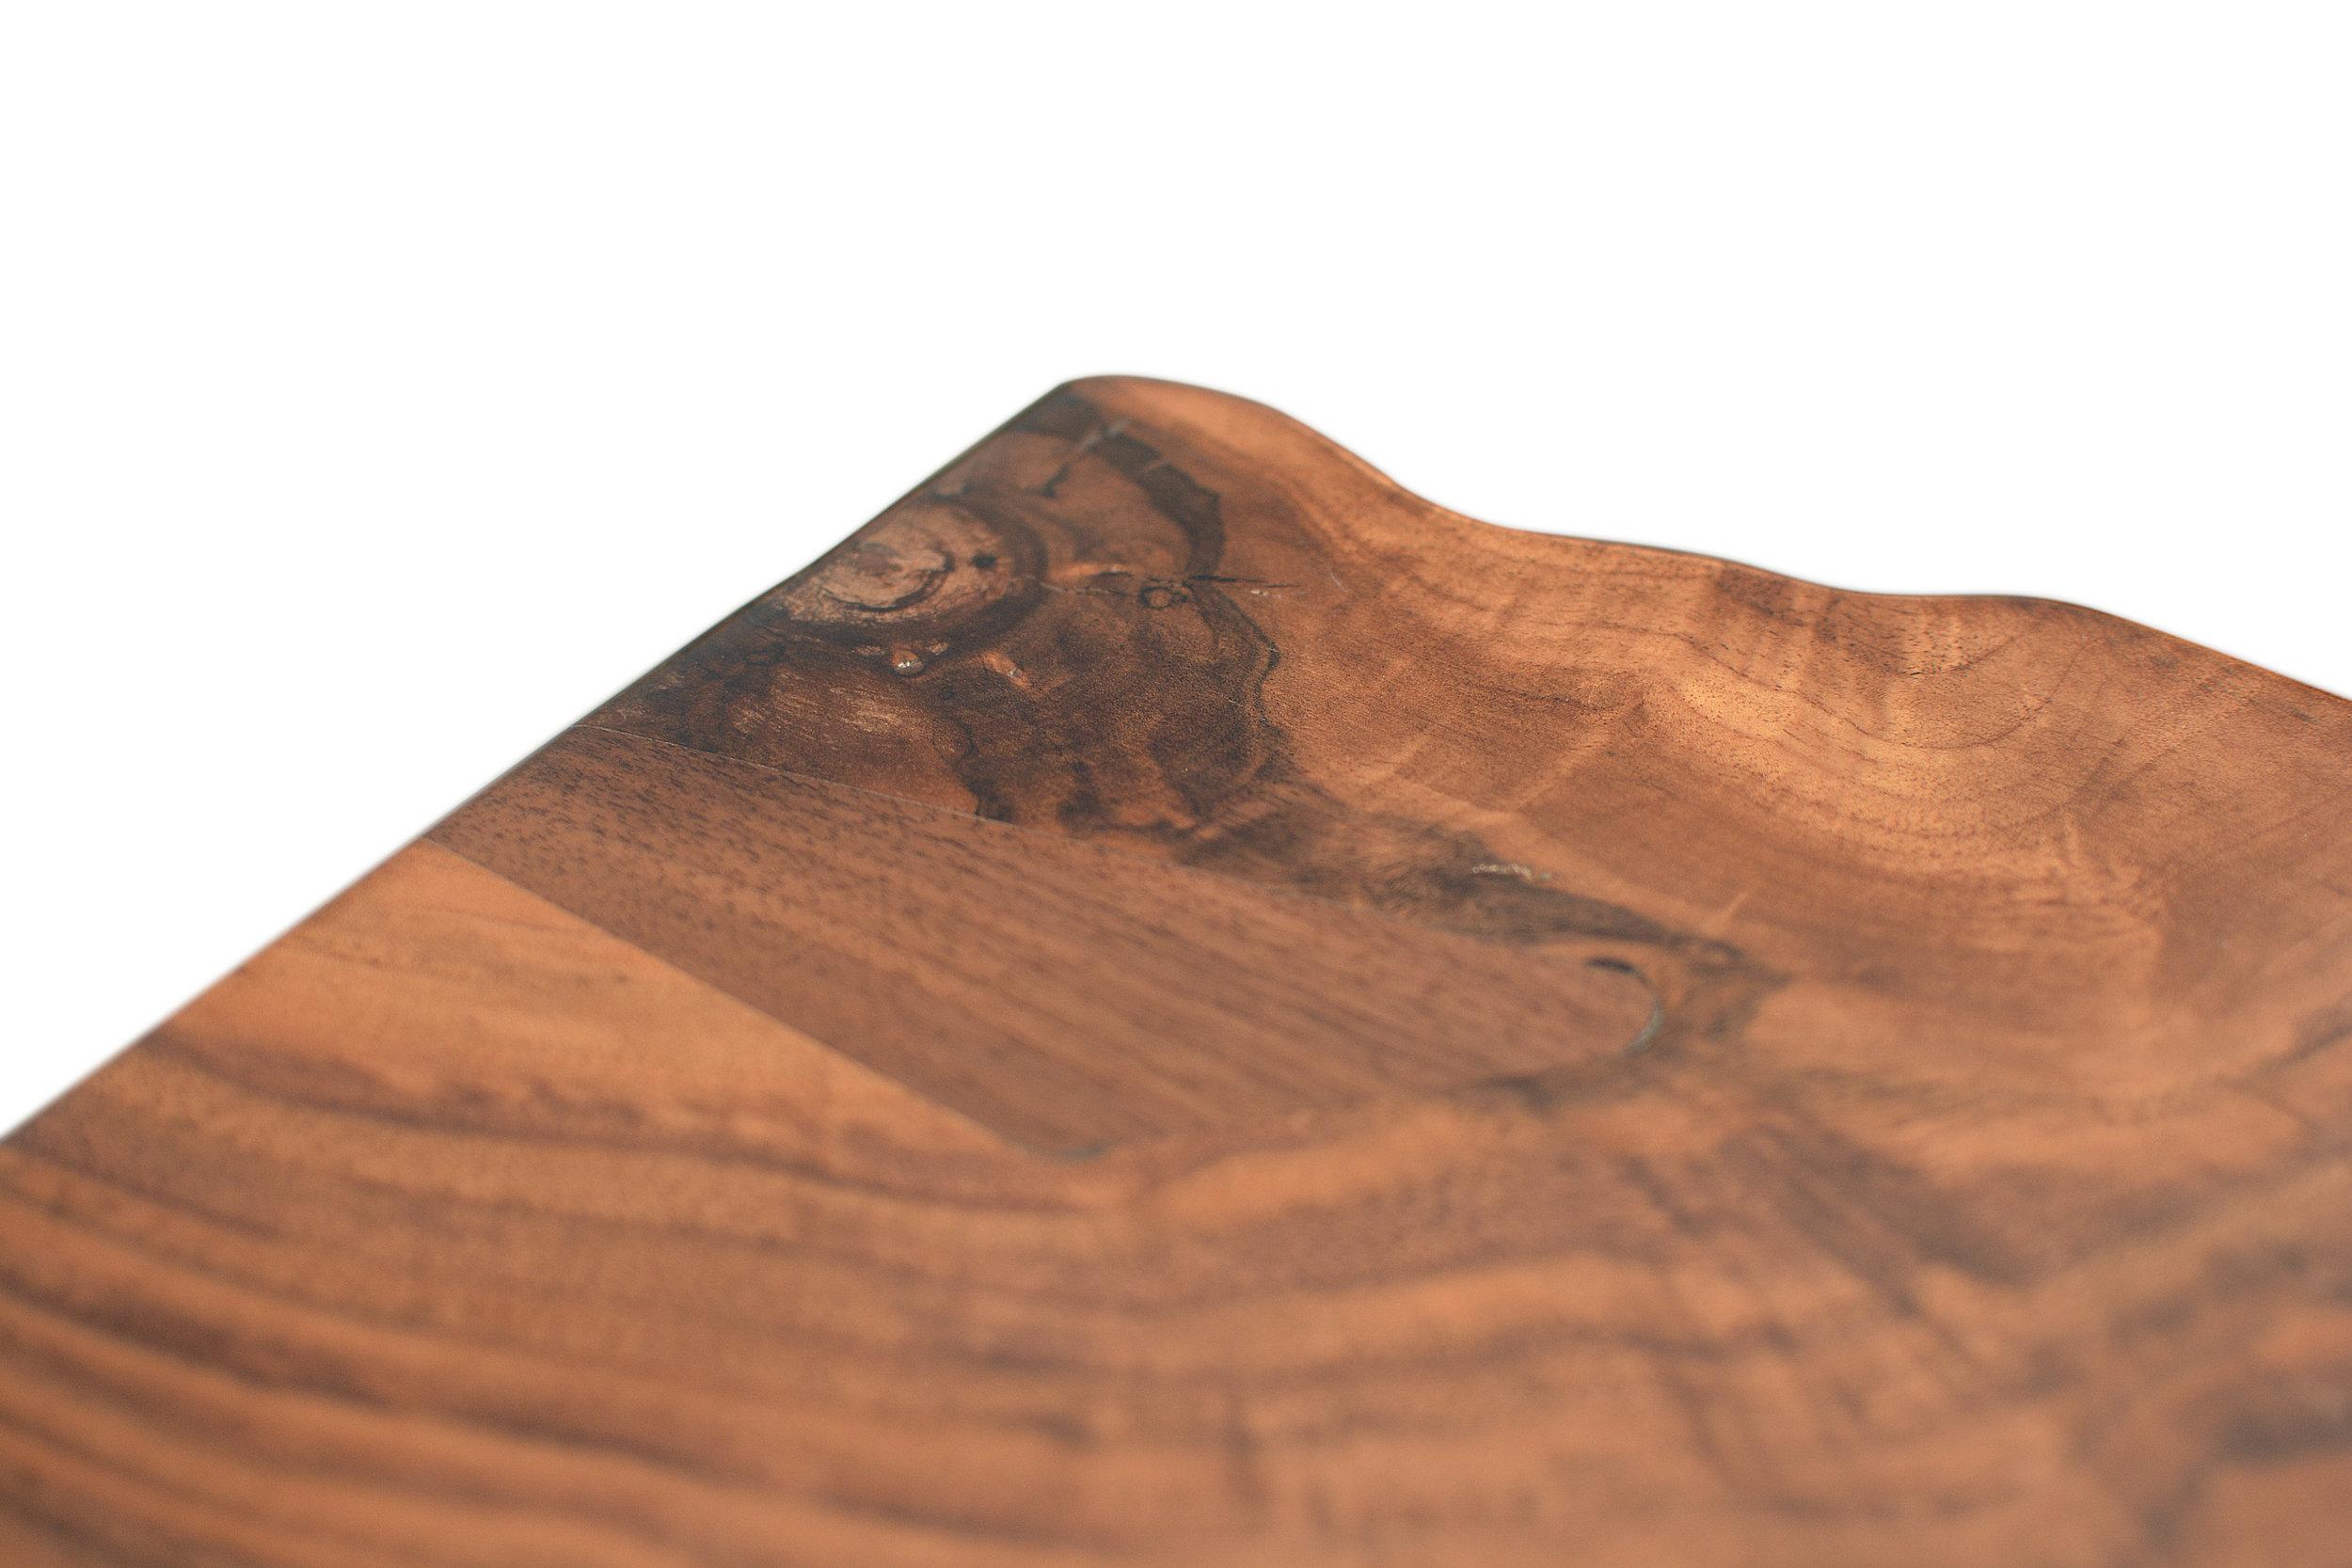 Etz & Steel Hermes Live Edge Walnut Table Close Up 16.JPG